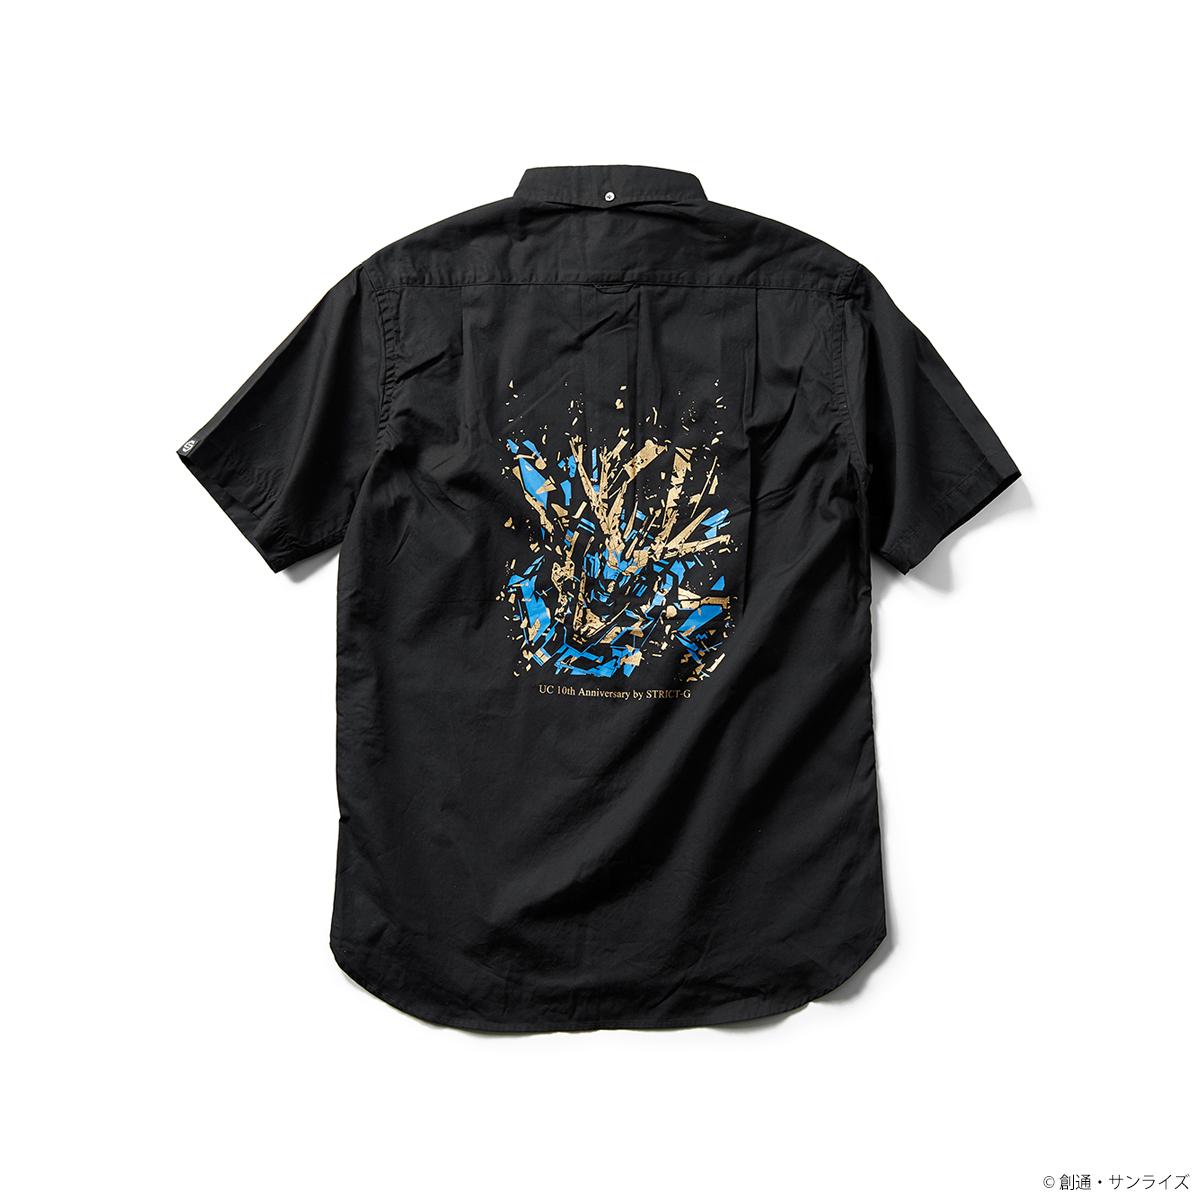 STRICT-G『機動戦士ガンダムUC』 OVA10周年記念 半袖ボタンダウンシャツ バンシィ